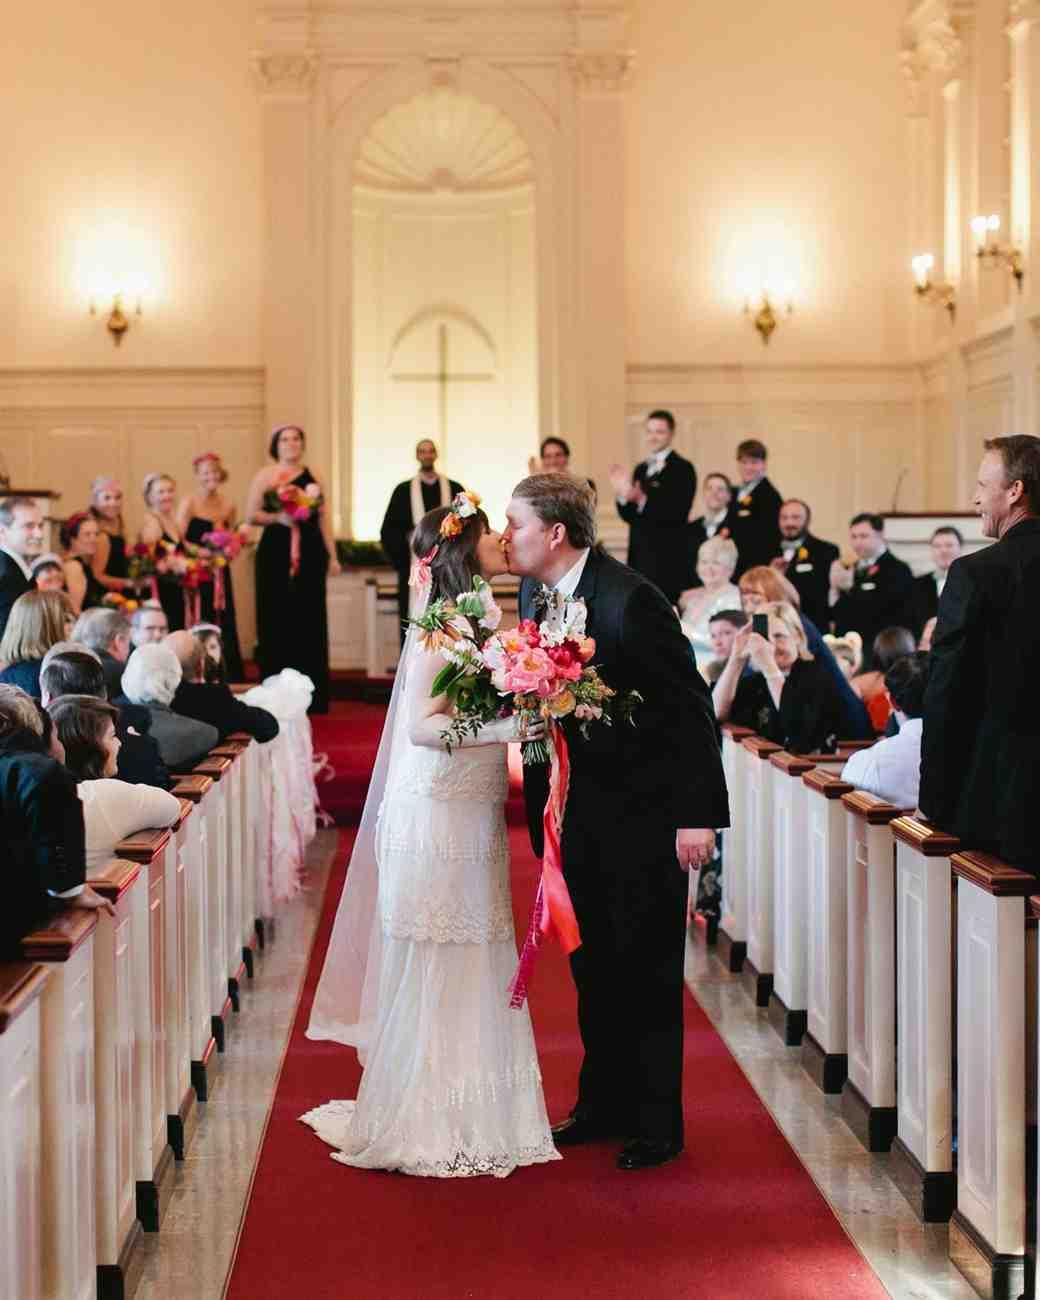 holly-john-wedding-texas-ceremony-recessional-kiss-083-s112833-0516.jpg